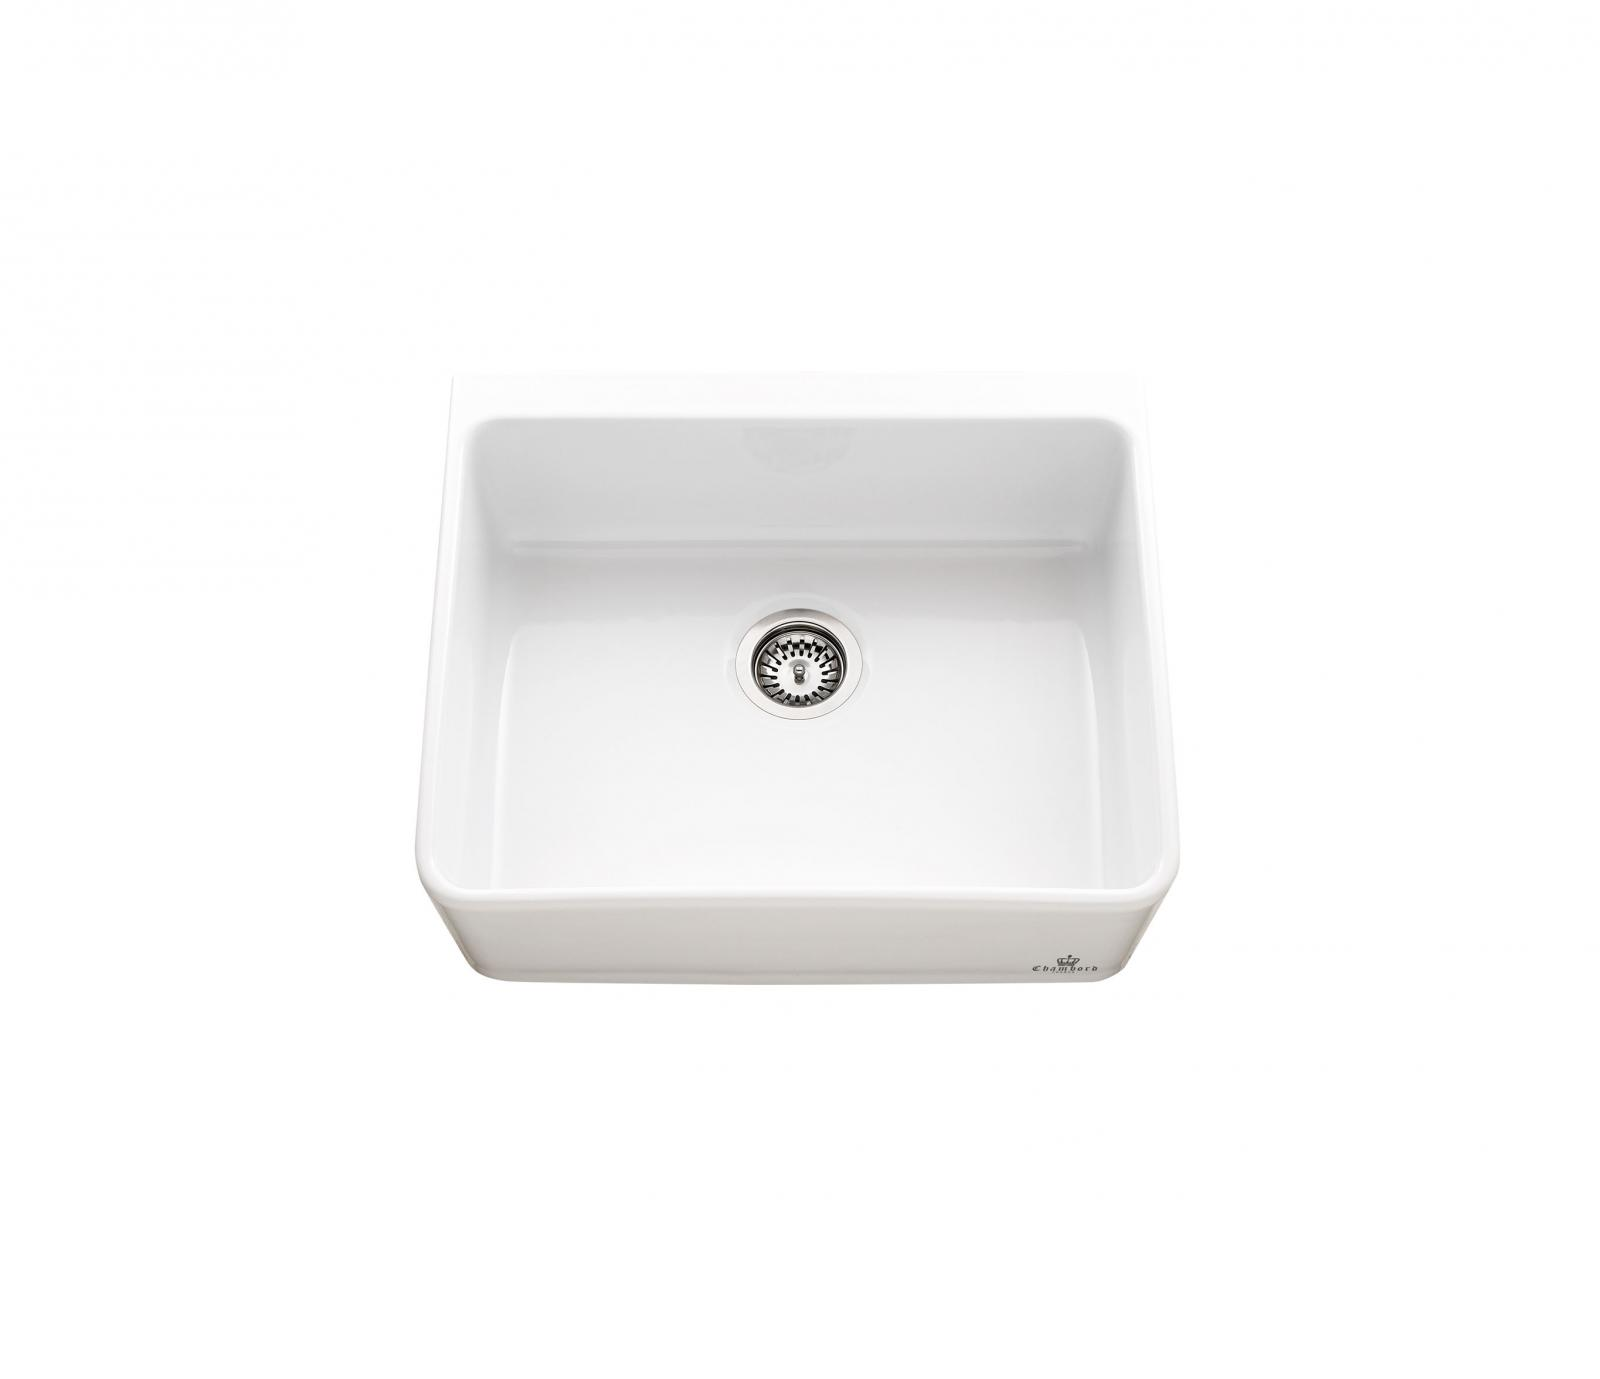 High-quality sink Clotaire I - single bowl, ceramic - ambience 2